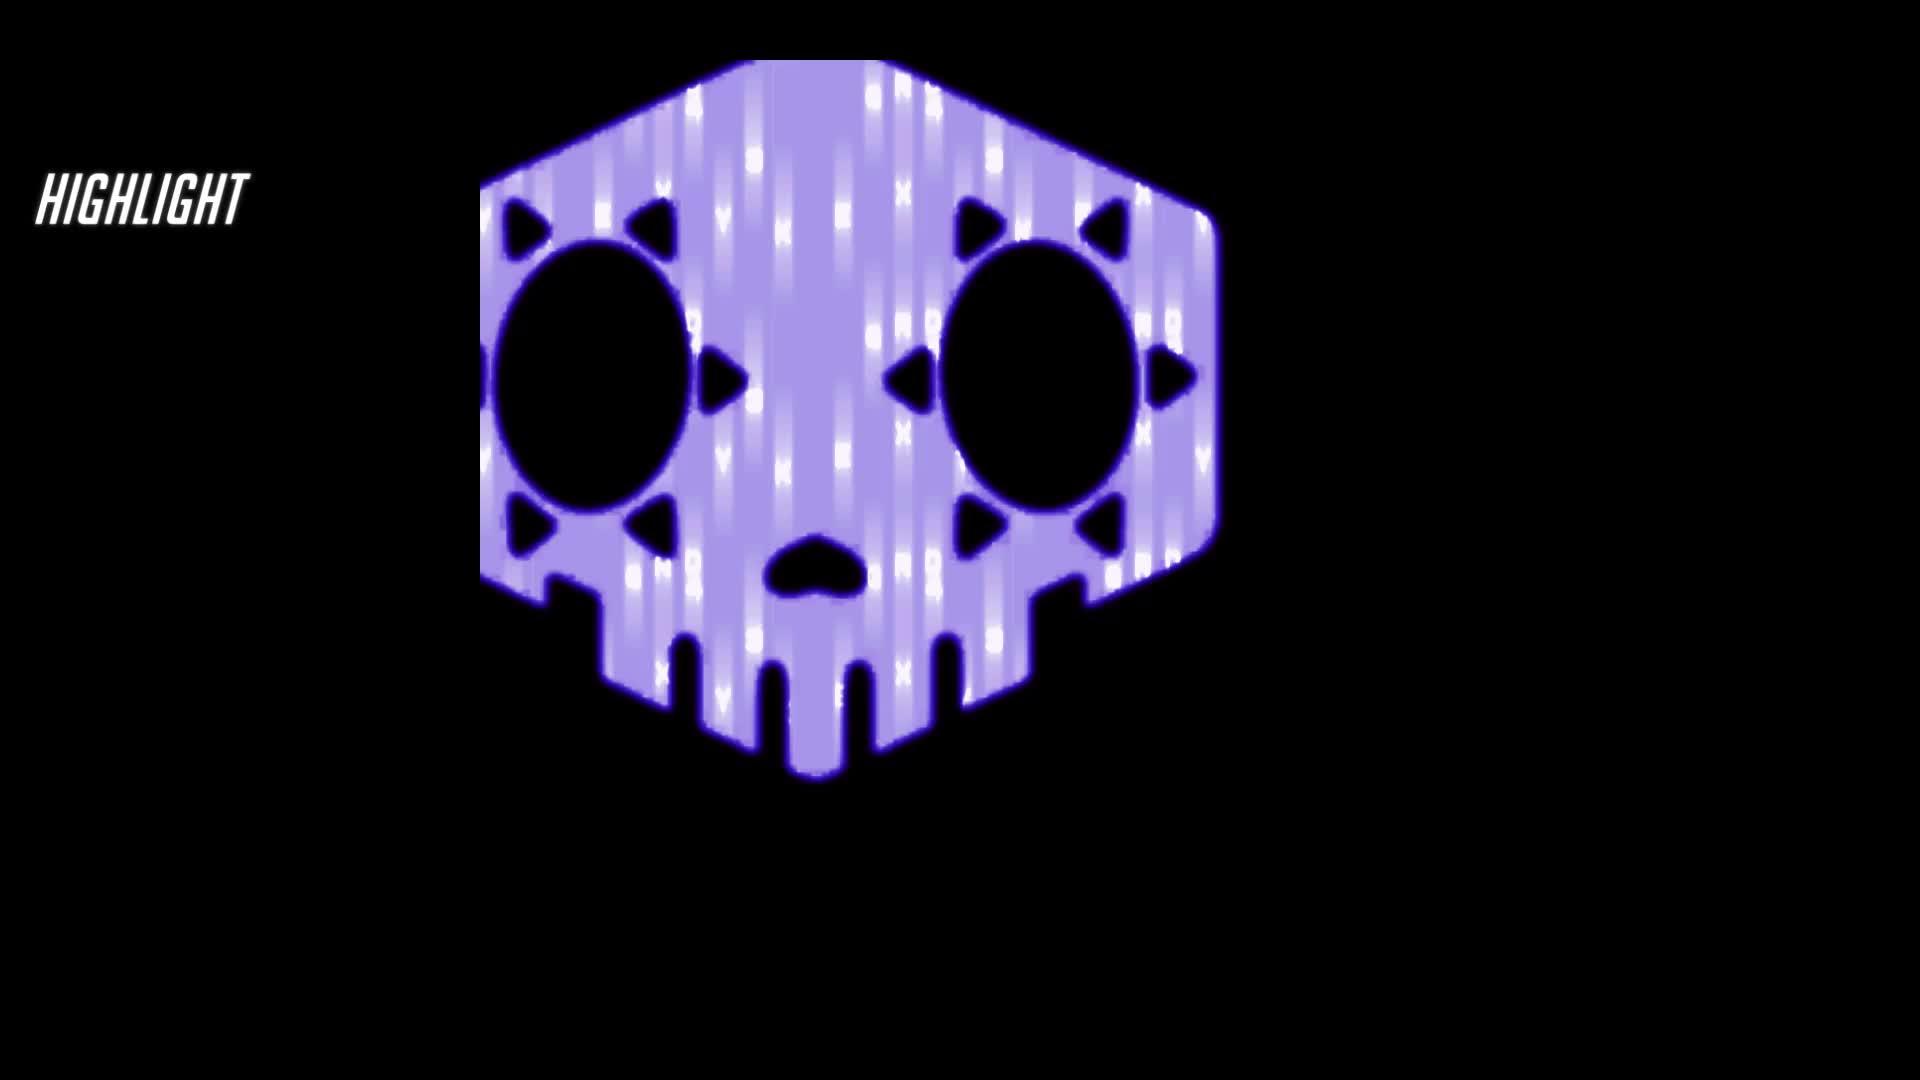 overwatch, sombra, isometric exercise 18-04-30 21-02-01 GIFs